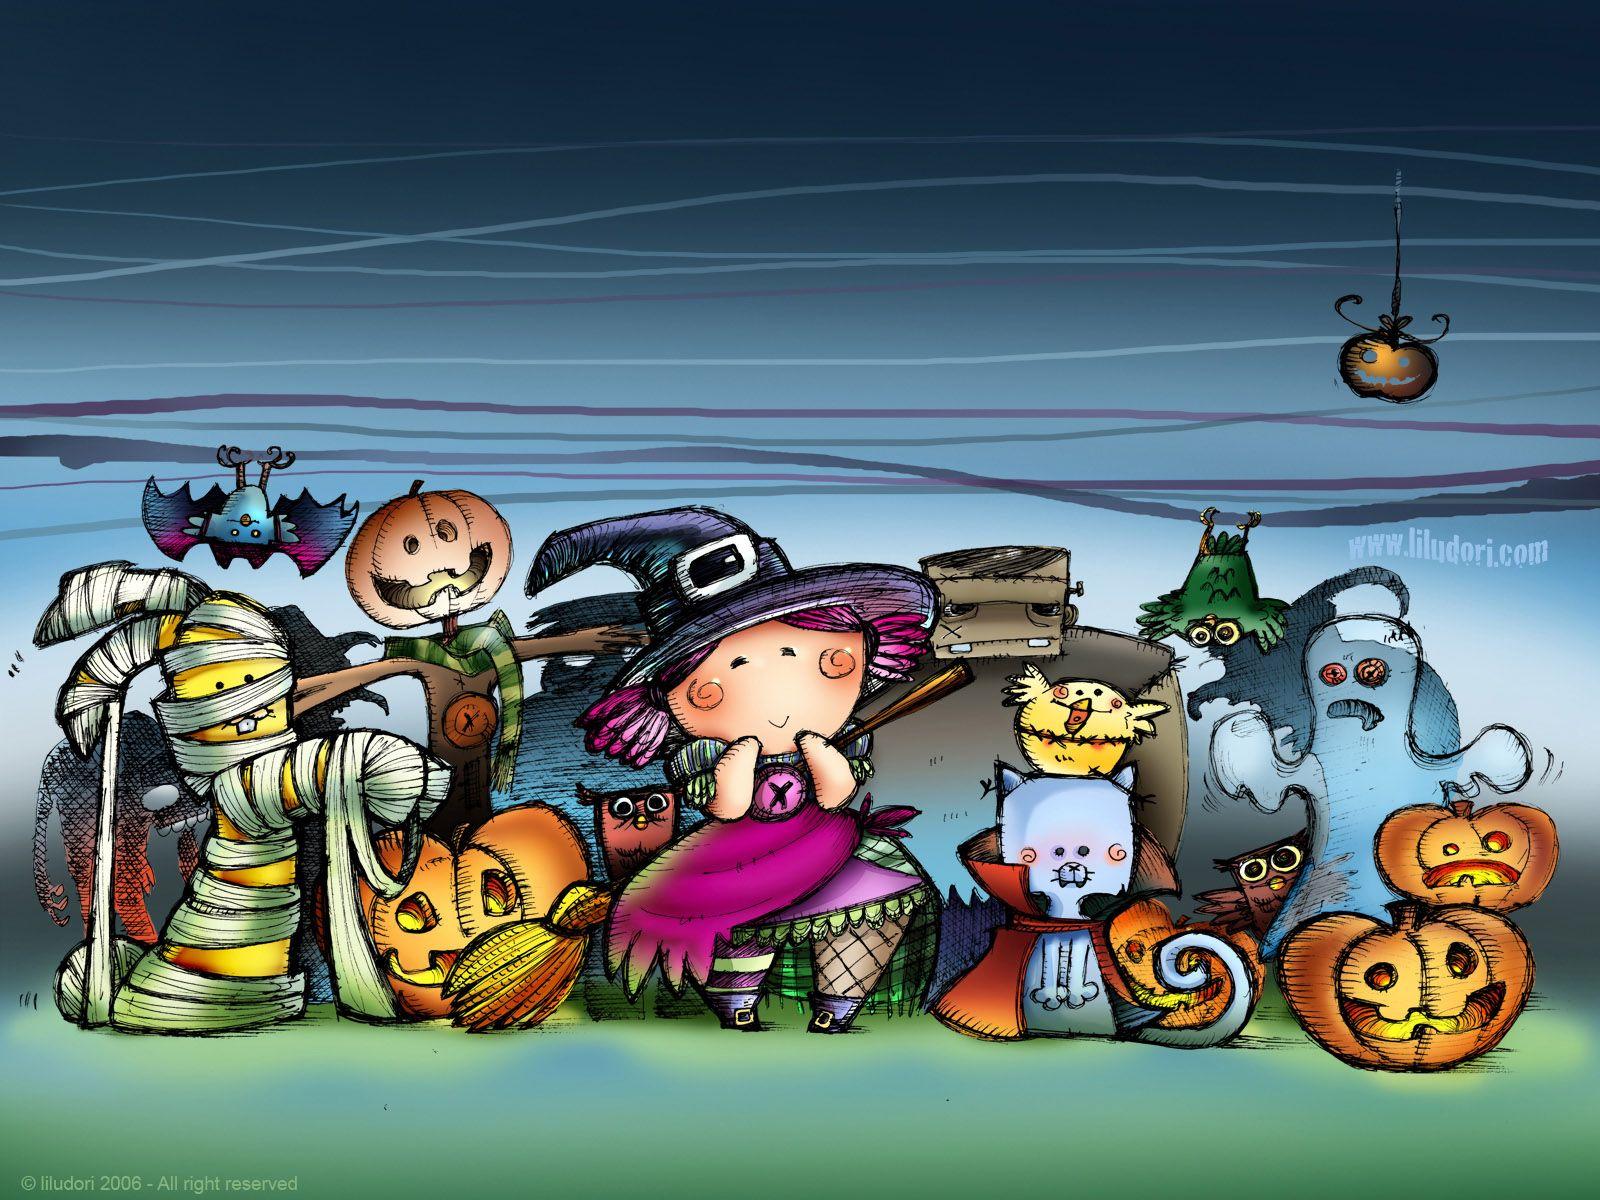 Download Wallpaper Halloween Pinterest - 1523f8d56b4b2d61991b16f64c675628  Gallery_585819.jpg